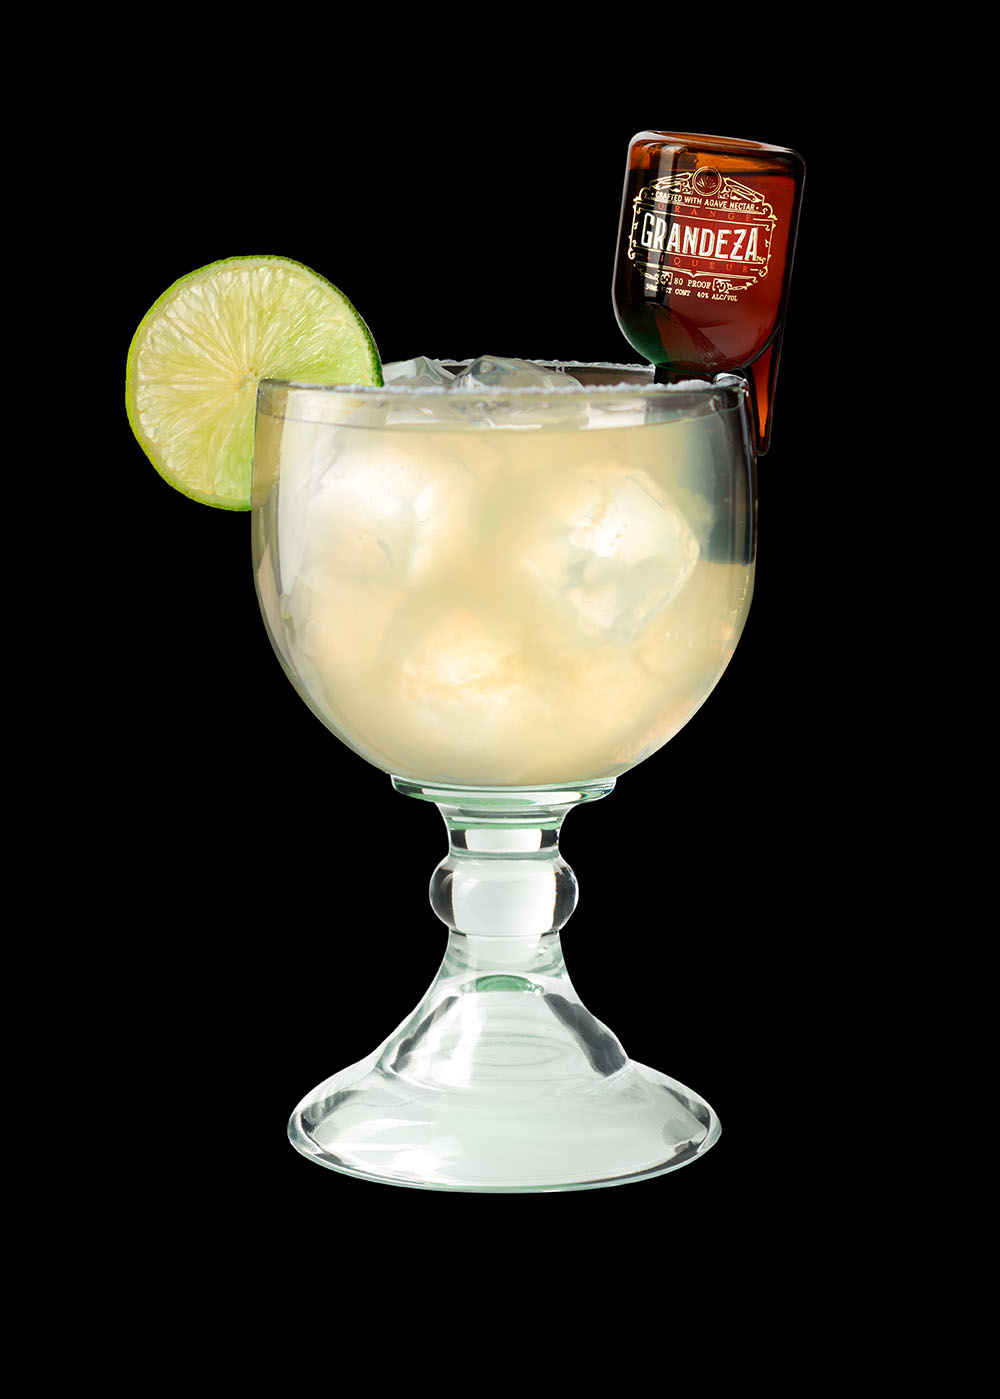 The Grandeza Margarita